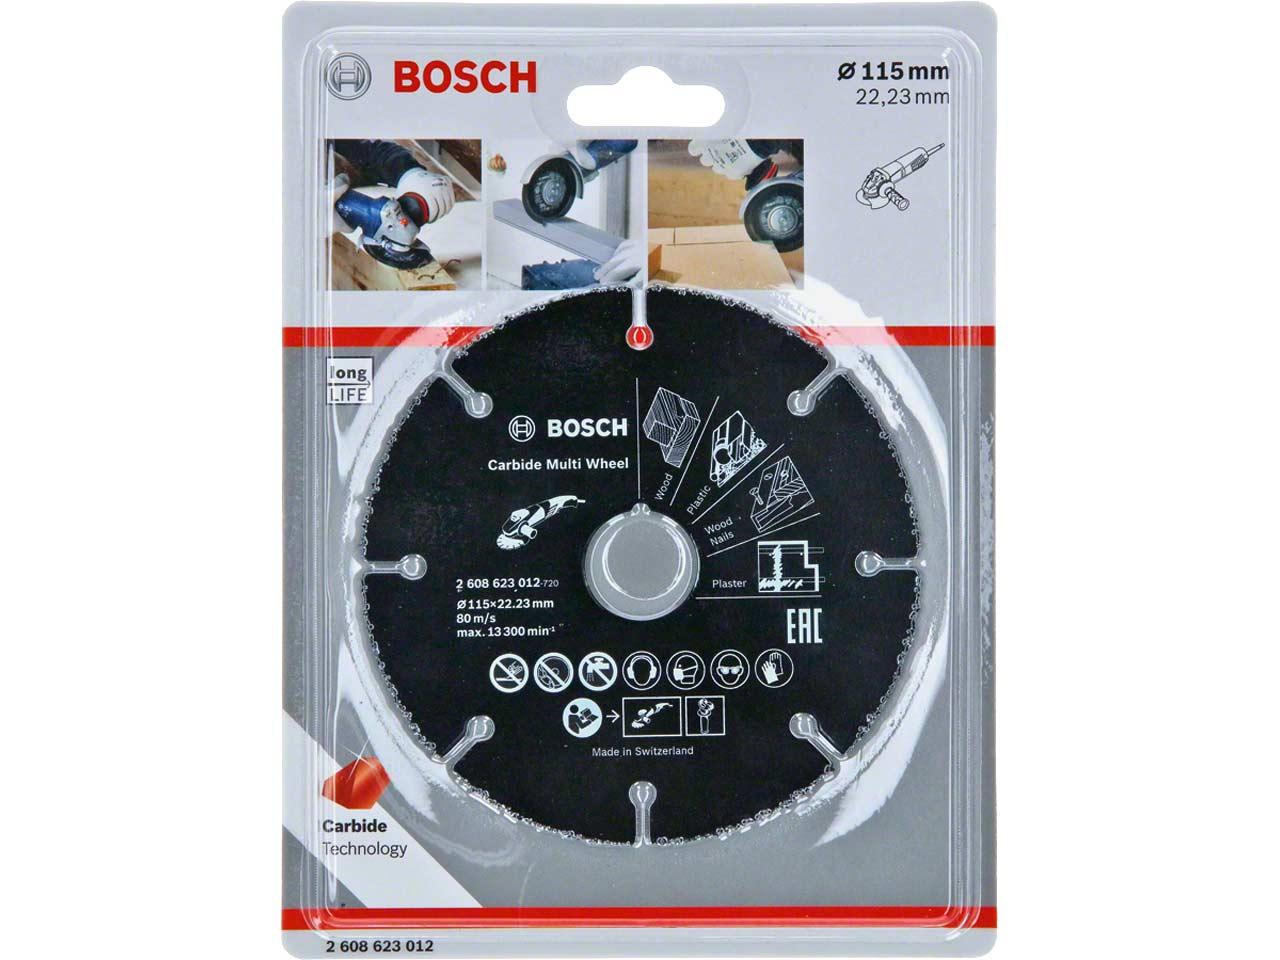 BOSCH multi cutting wheel CARBIDE 115mm GRINDER 2608623012 wood//plastic//plaster